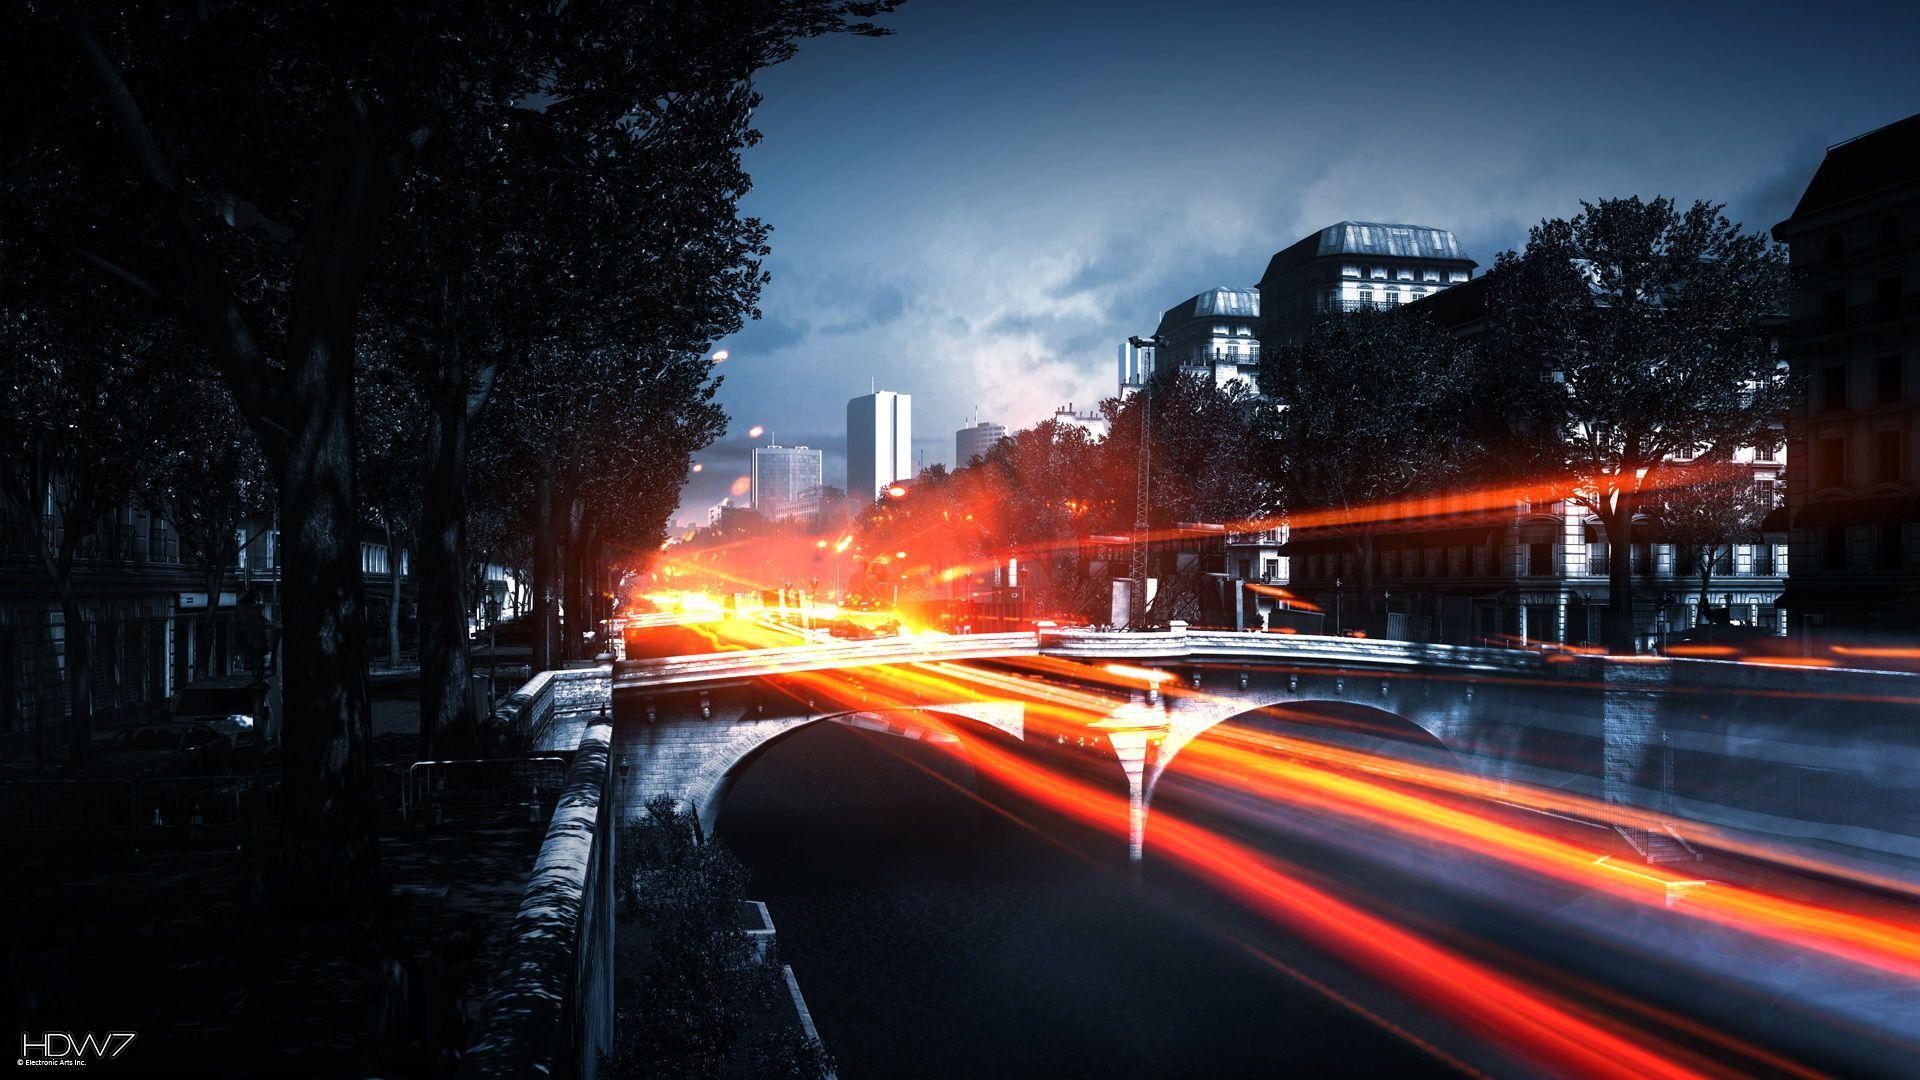 Battlefield 4 City Wallpapers - Top Free Battlefield 4 City